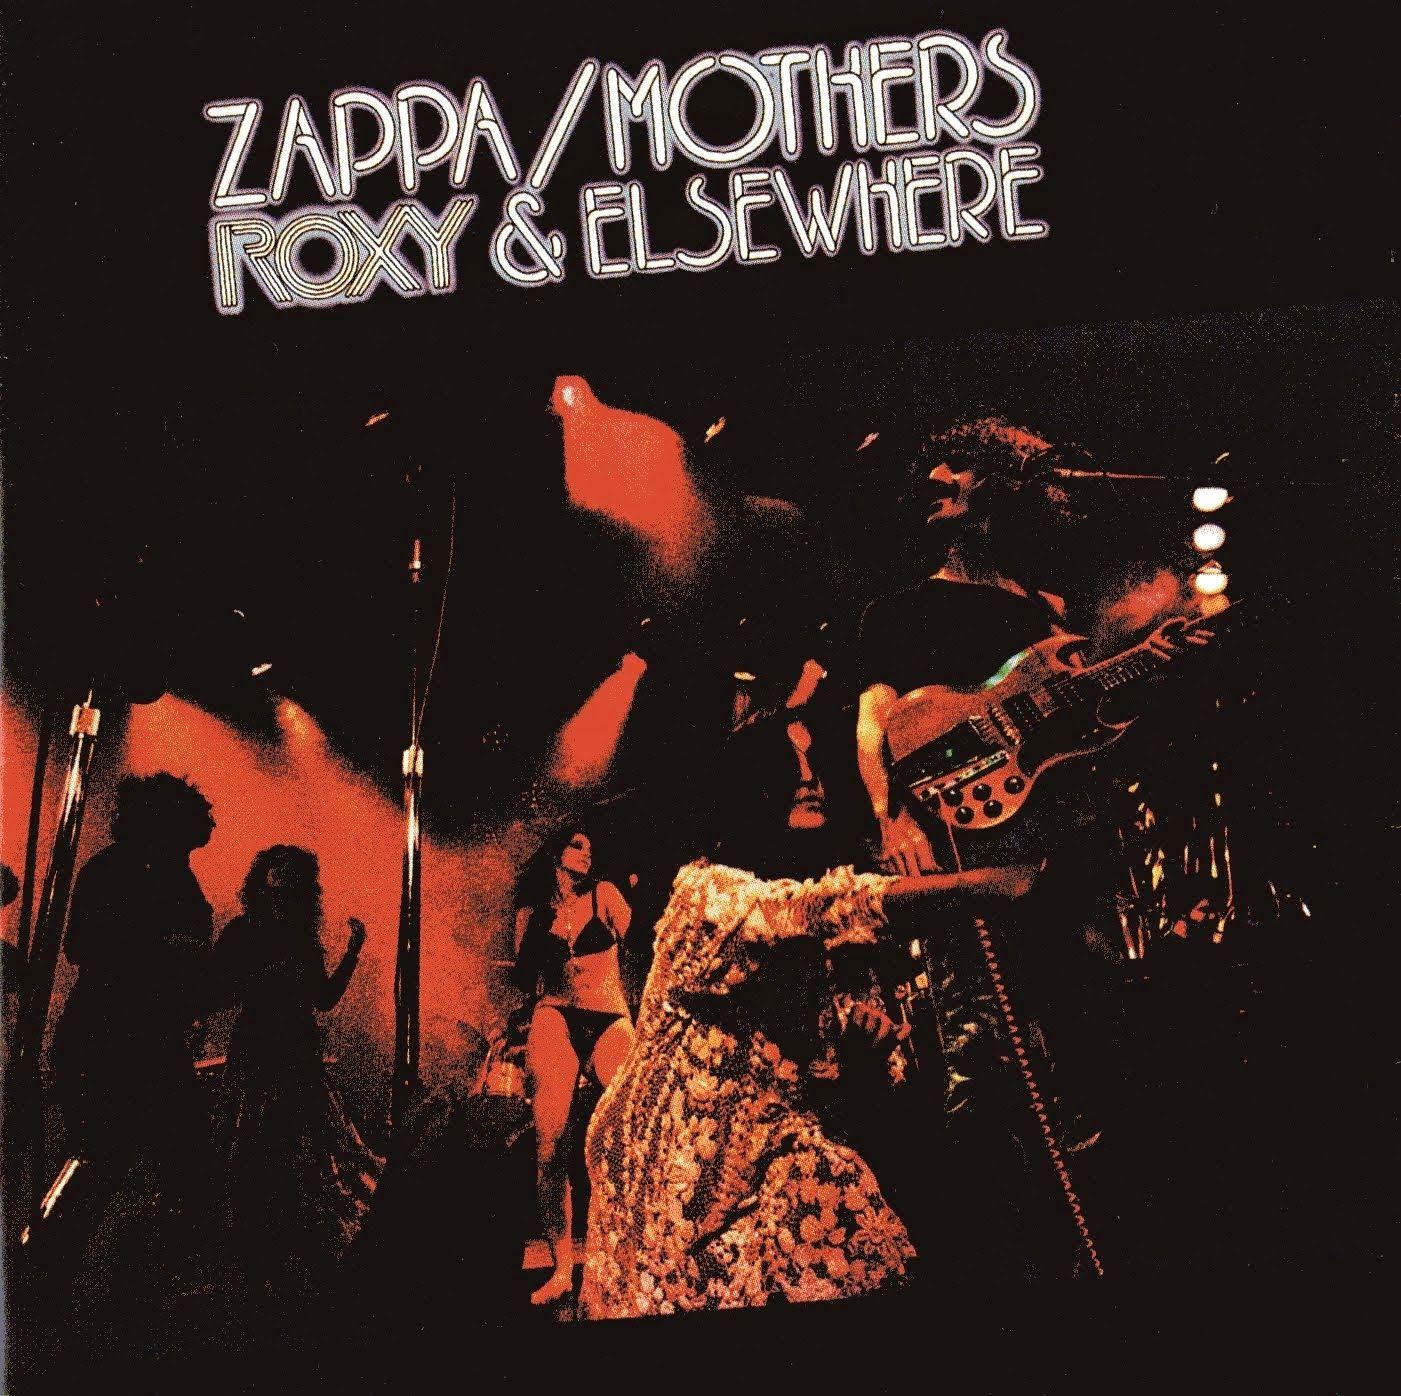 Zappa Mothers Quot Roxy Amp Elsewhere Quot 1974 Album Art